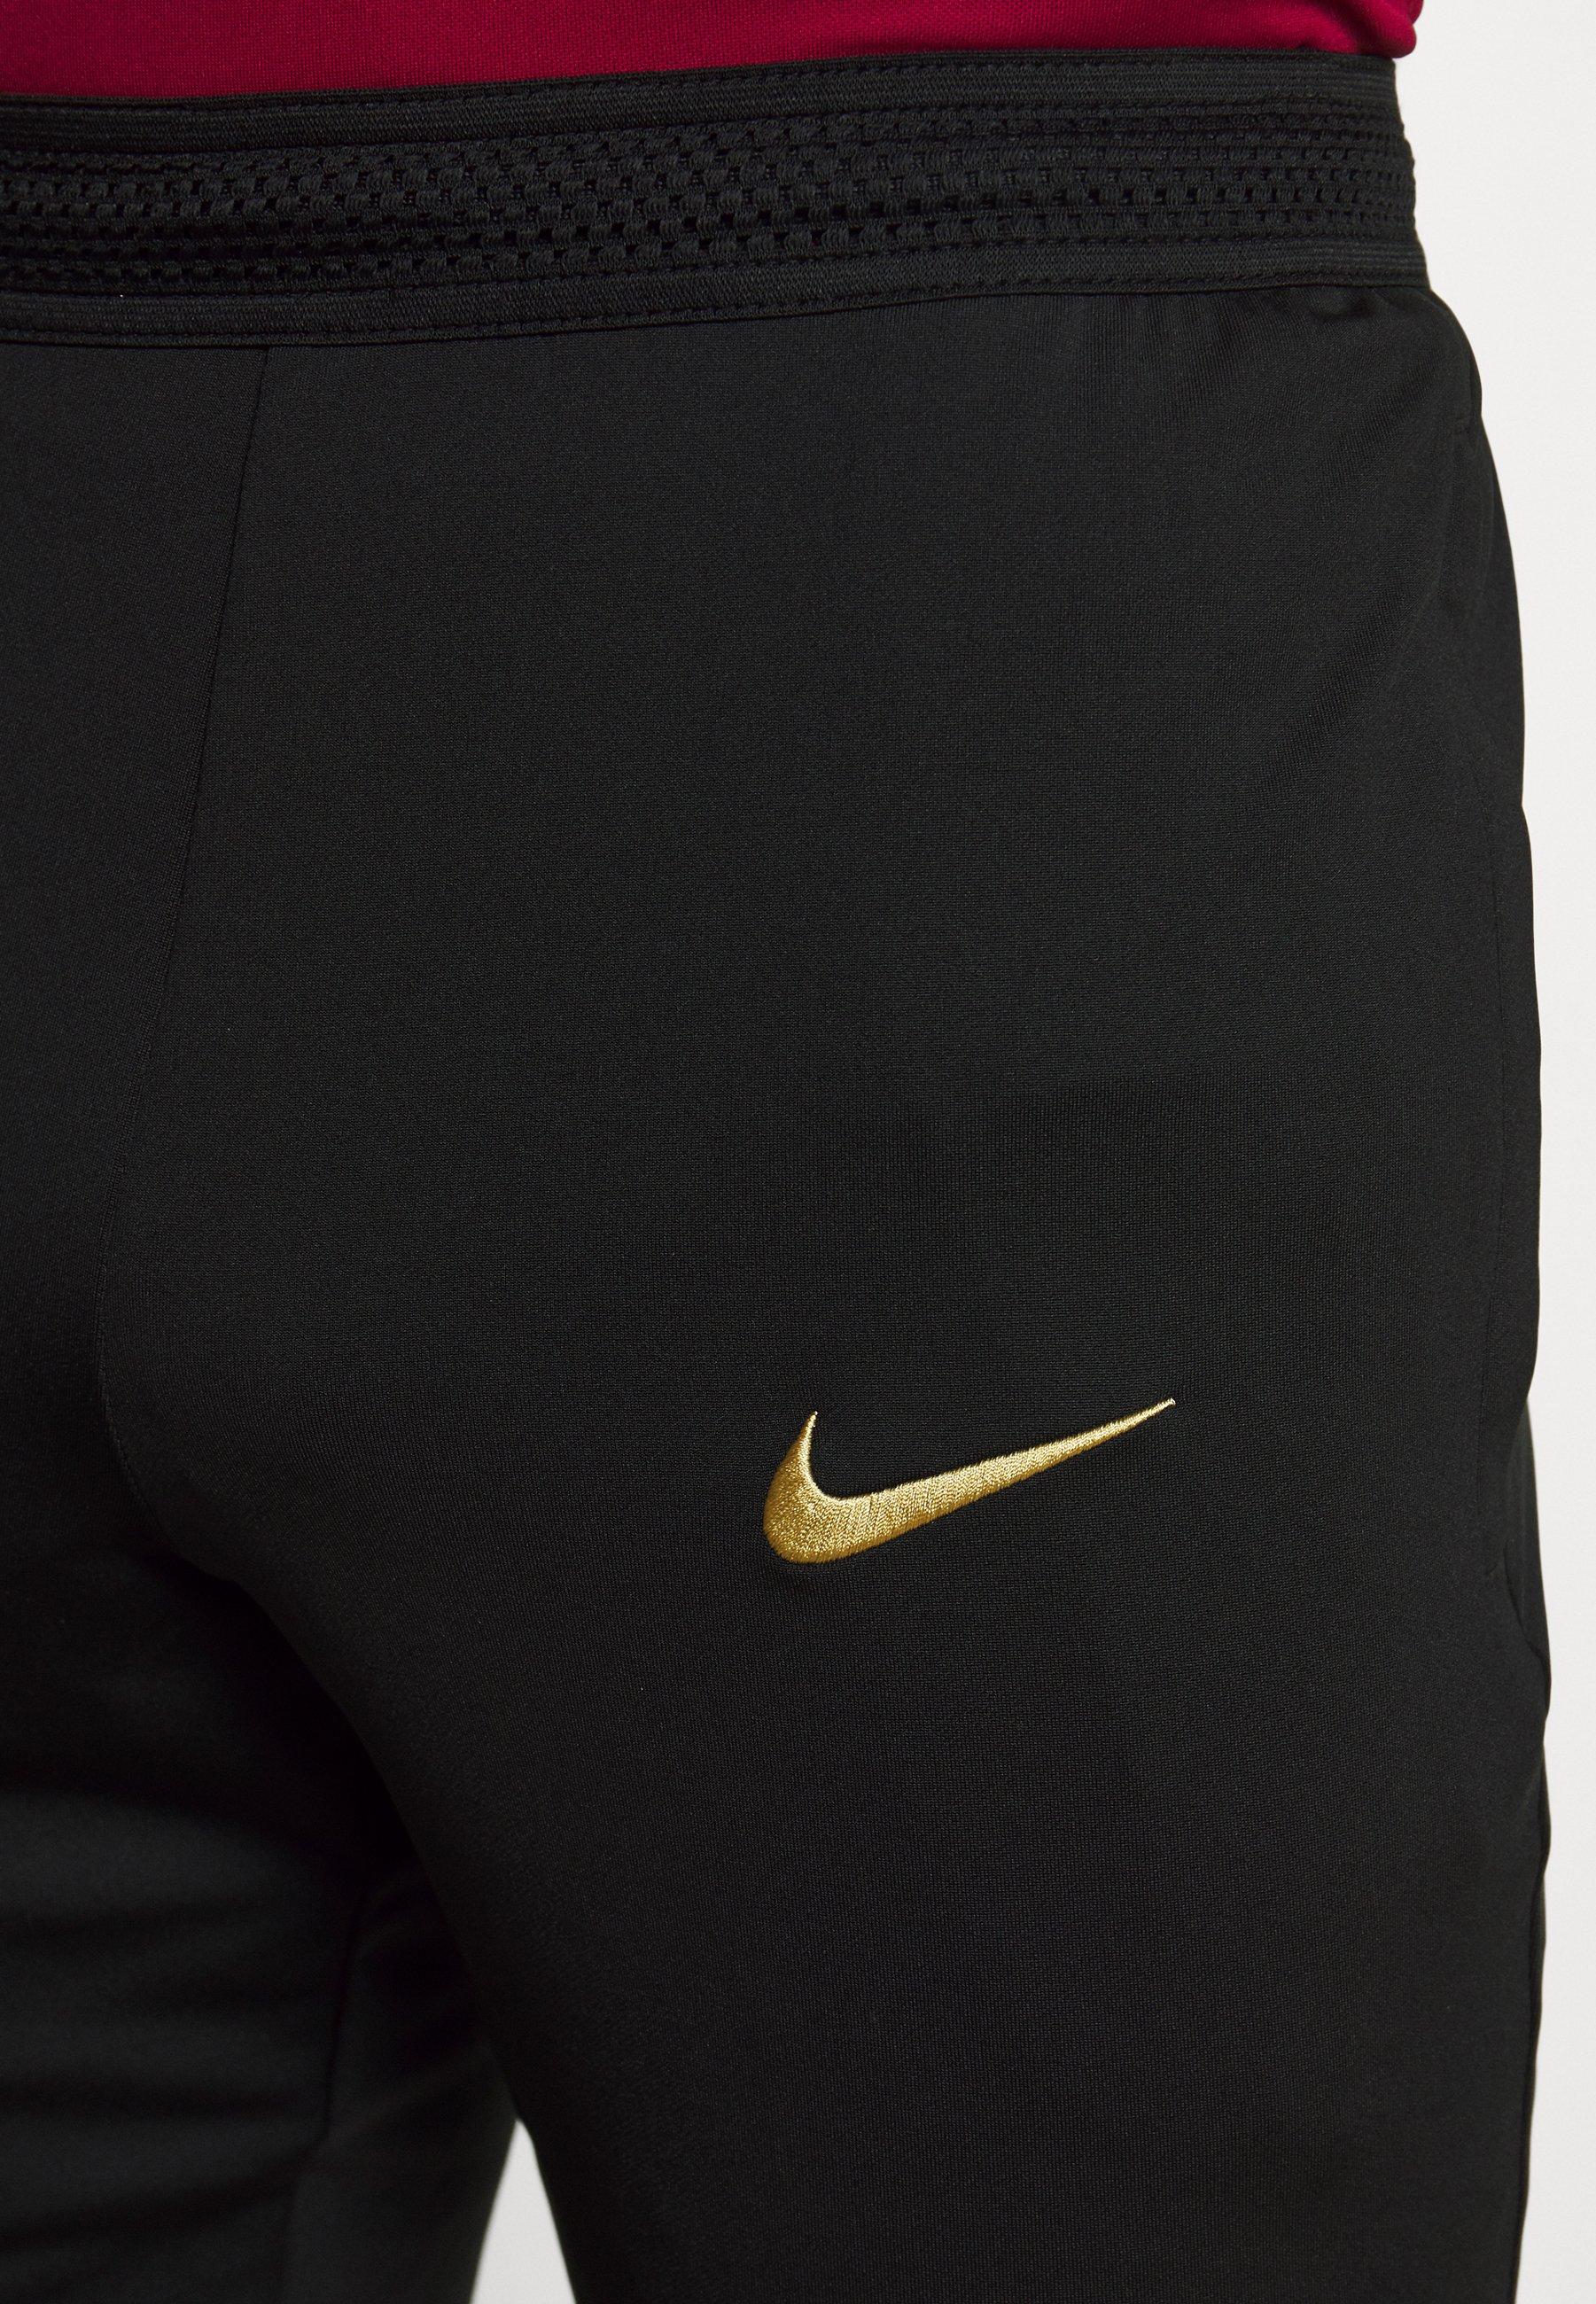 Black Friday 2019 Nike SB | La sélection irrésistible de Zalando